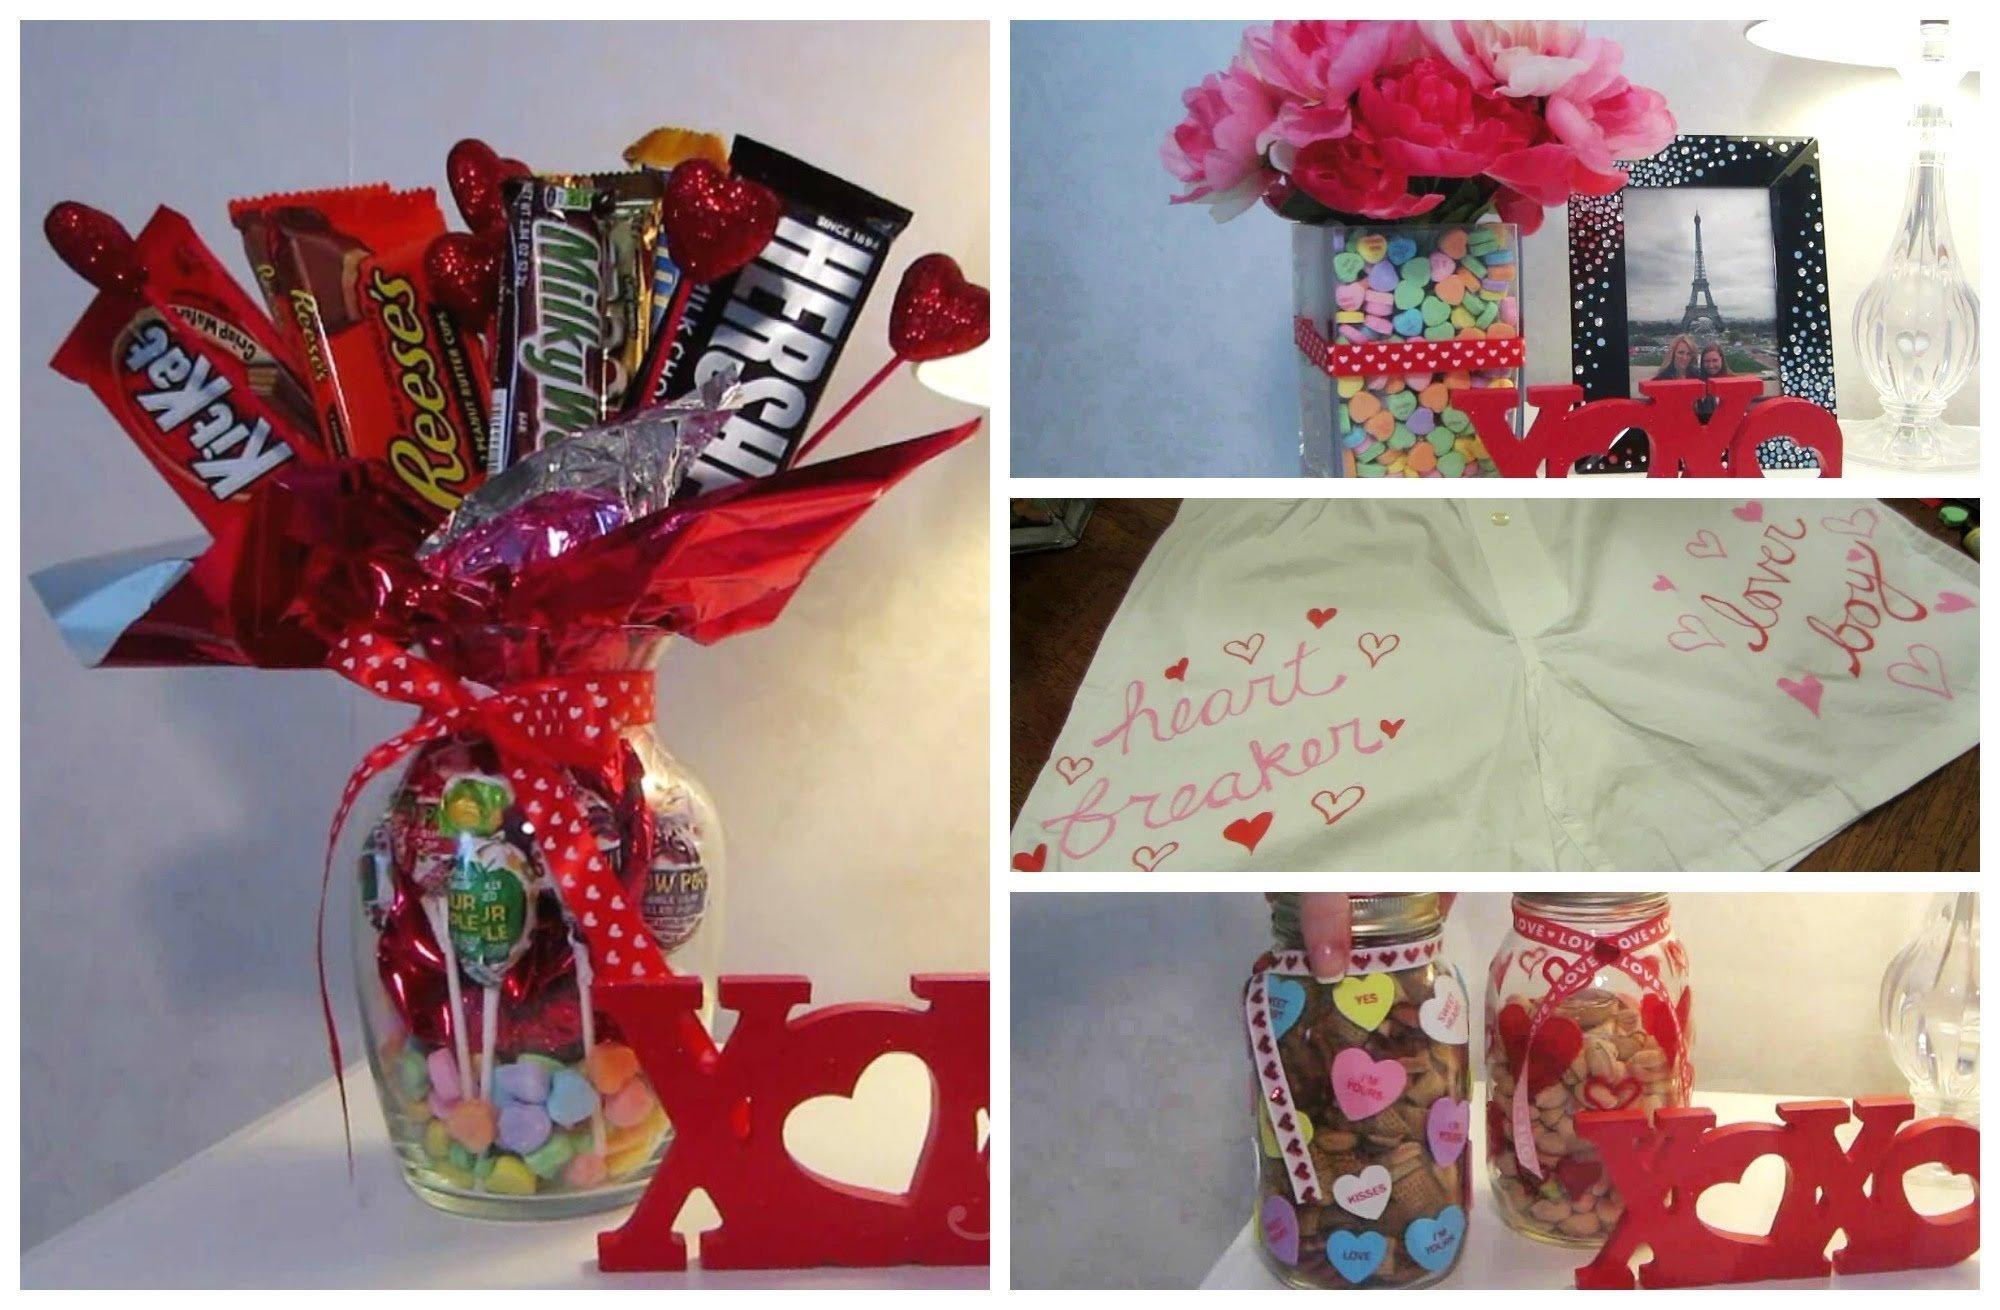 10 Attractive Creative Valentines Day Ideas For Girlfriend cute valentine diy gift ideas youtube 7 2020